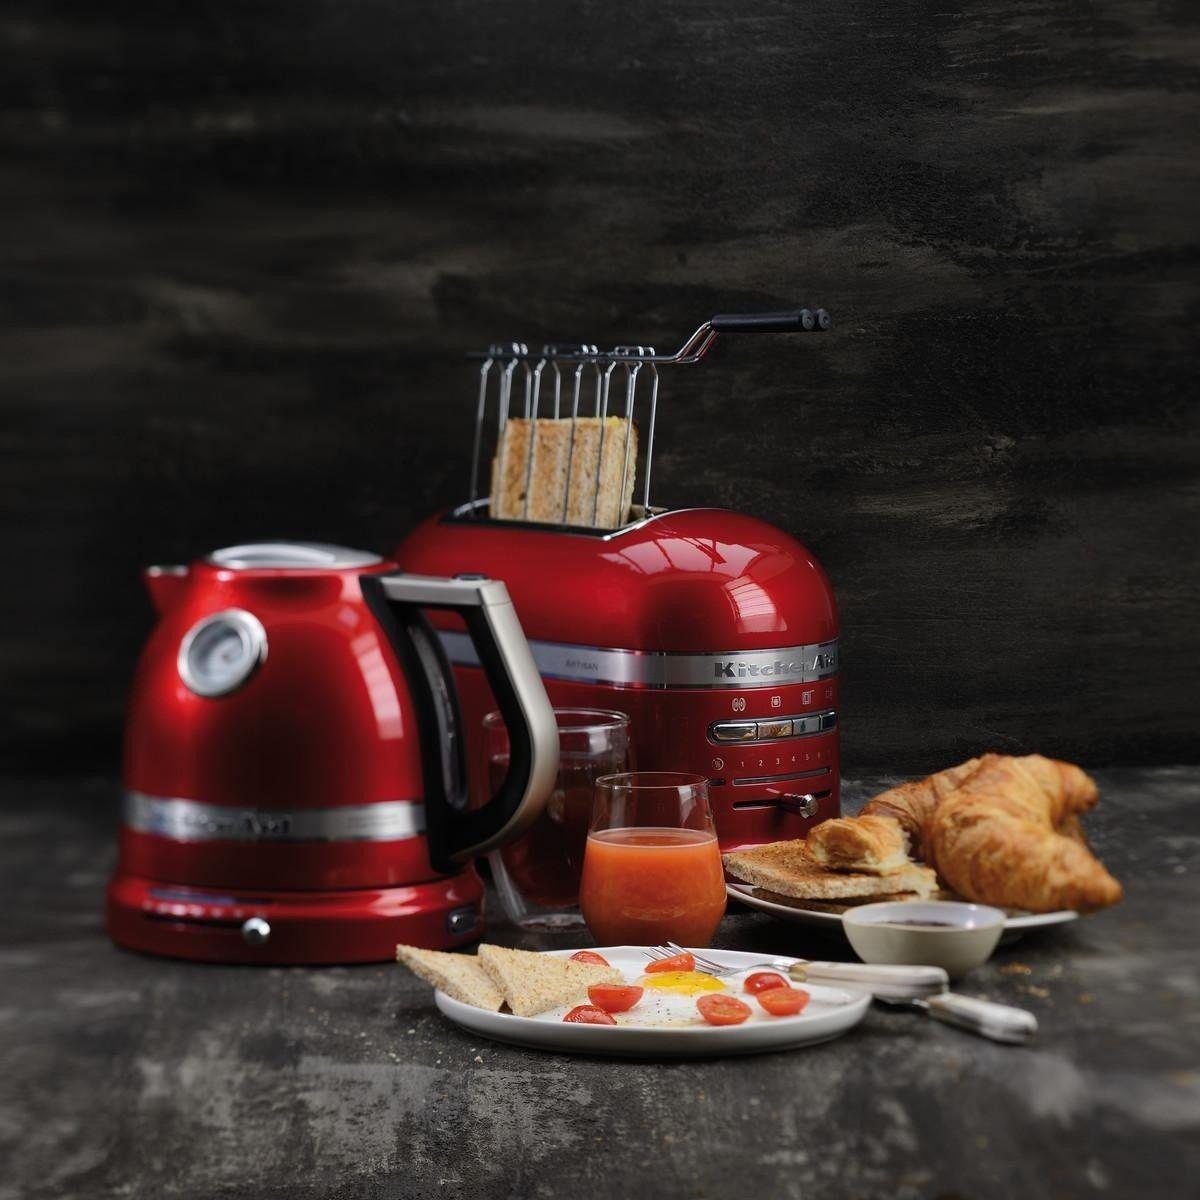 kitchenaid artisan 5kek1522e kettle kitchenaid. Black Bedroom Furniture Sets. Home Design Ideas